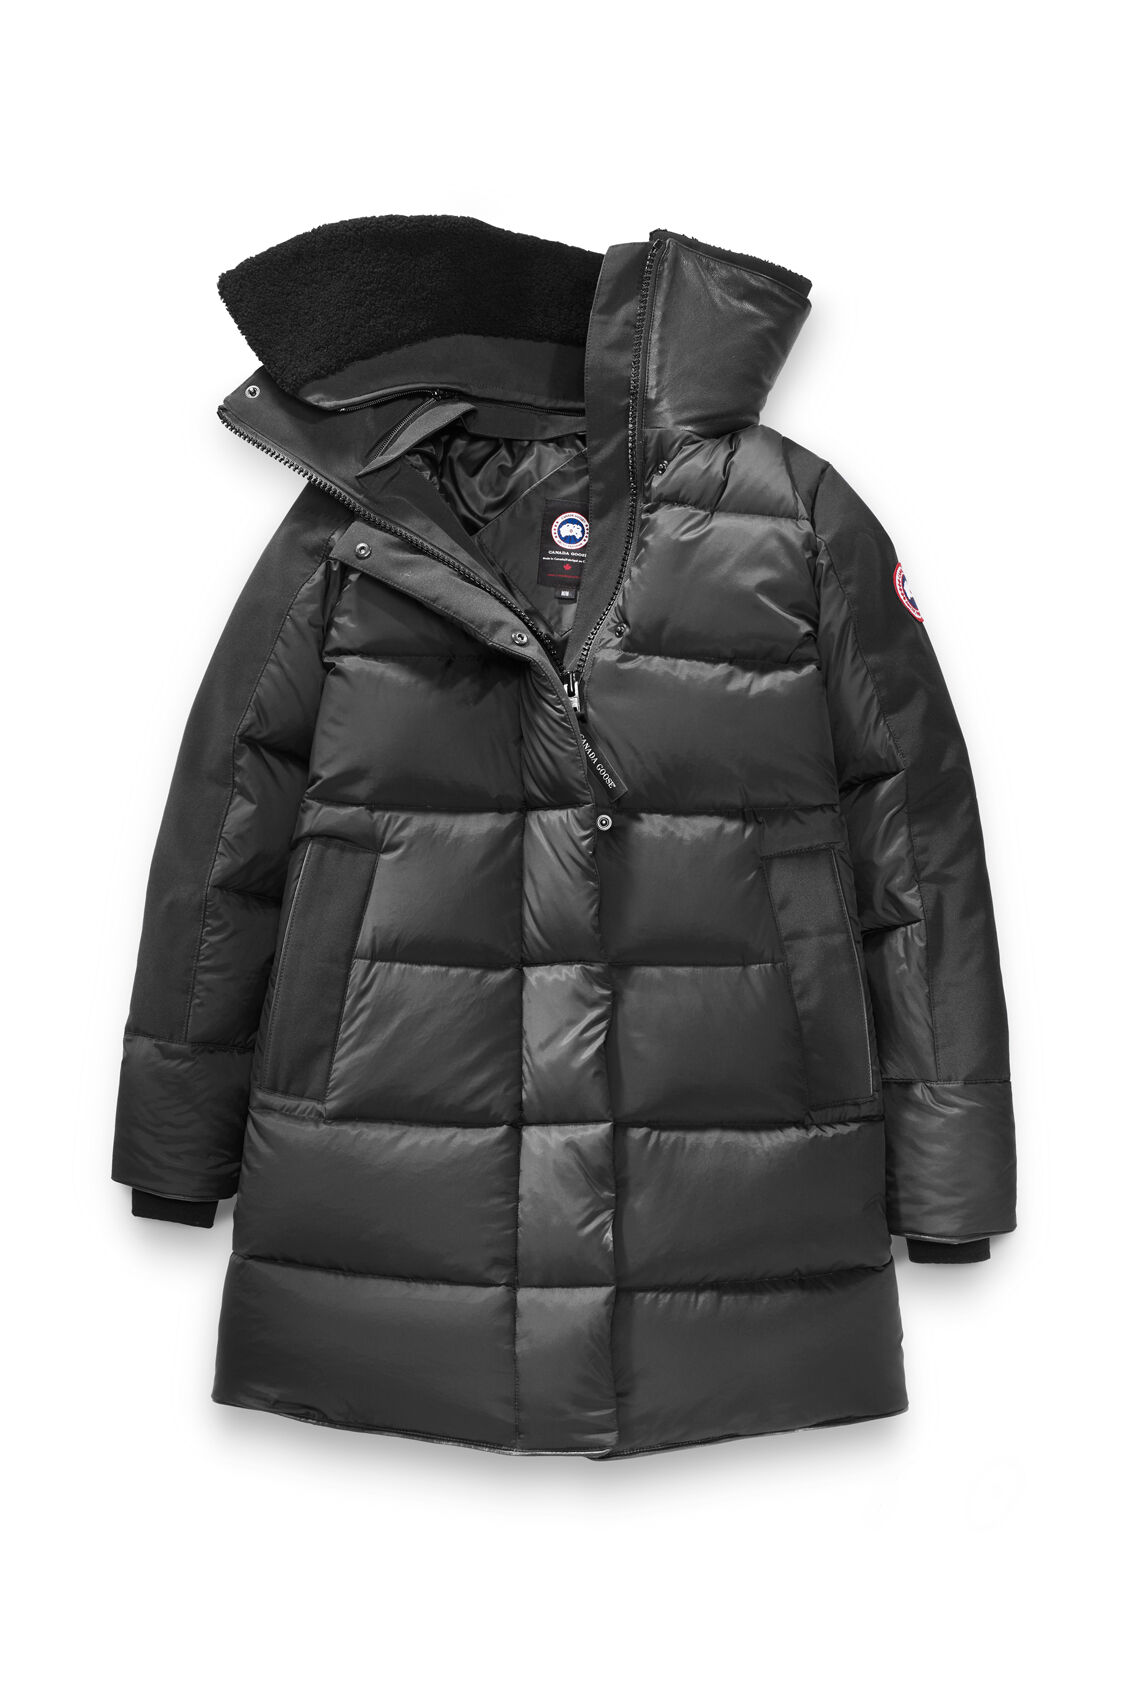 Women's black parka style jacket